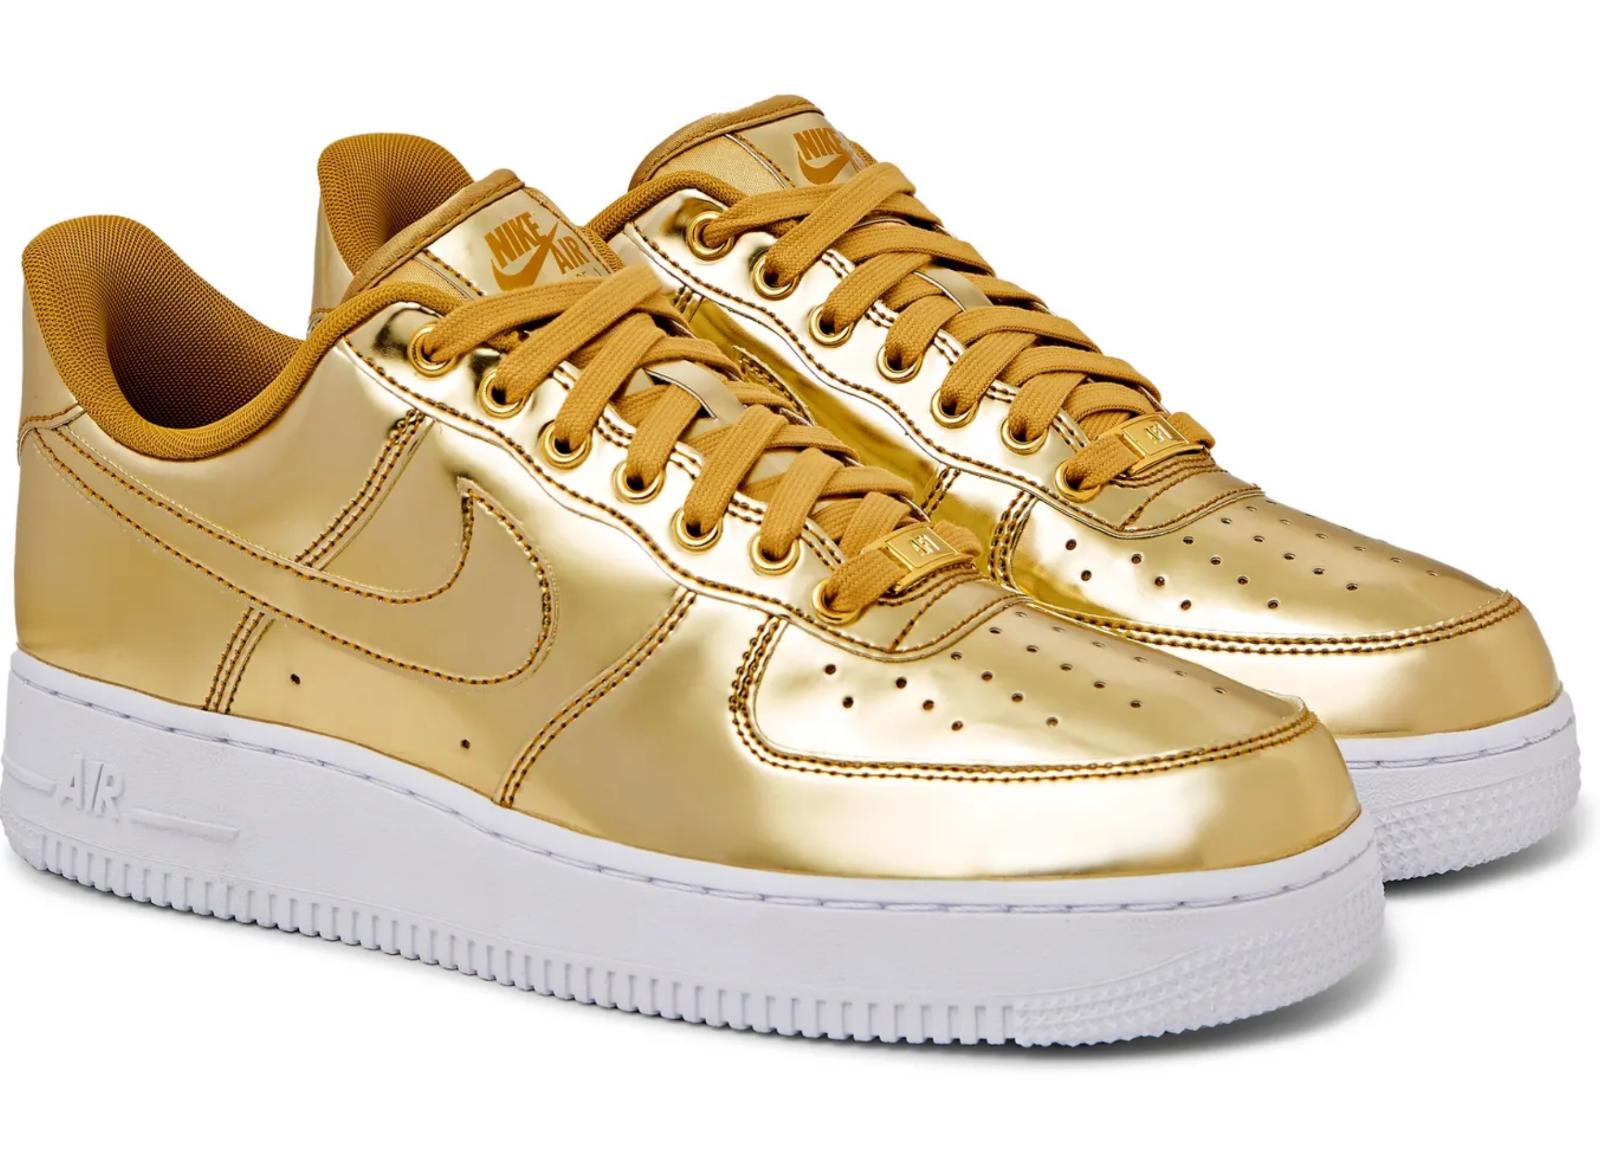 Nike Air Force 1 Sport Métallique Brevet Argent Baskets Chaussures